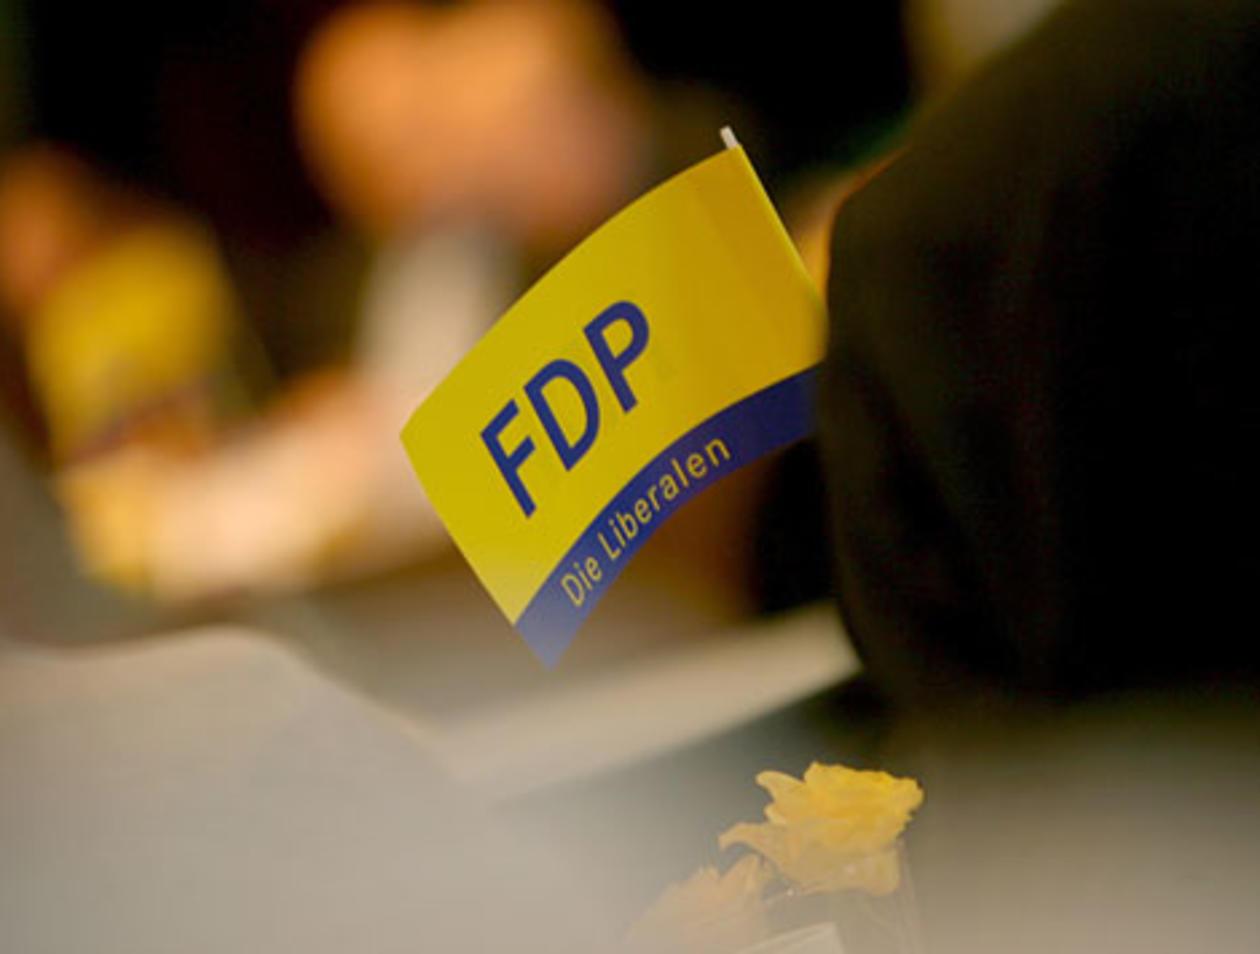 Dreieich Hessen Finanzen Fdp Malt Den Schuldenteufel An Die Wand